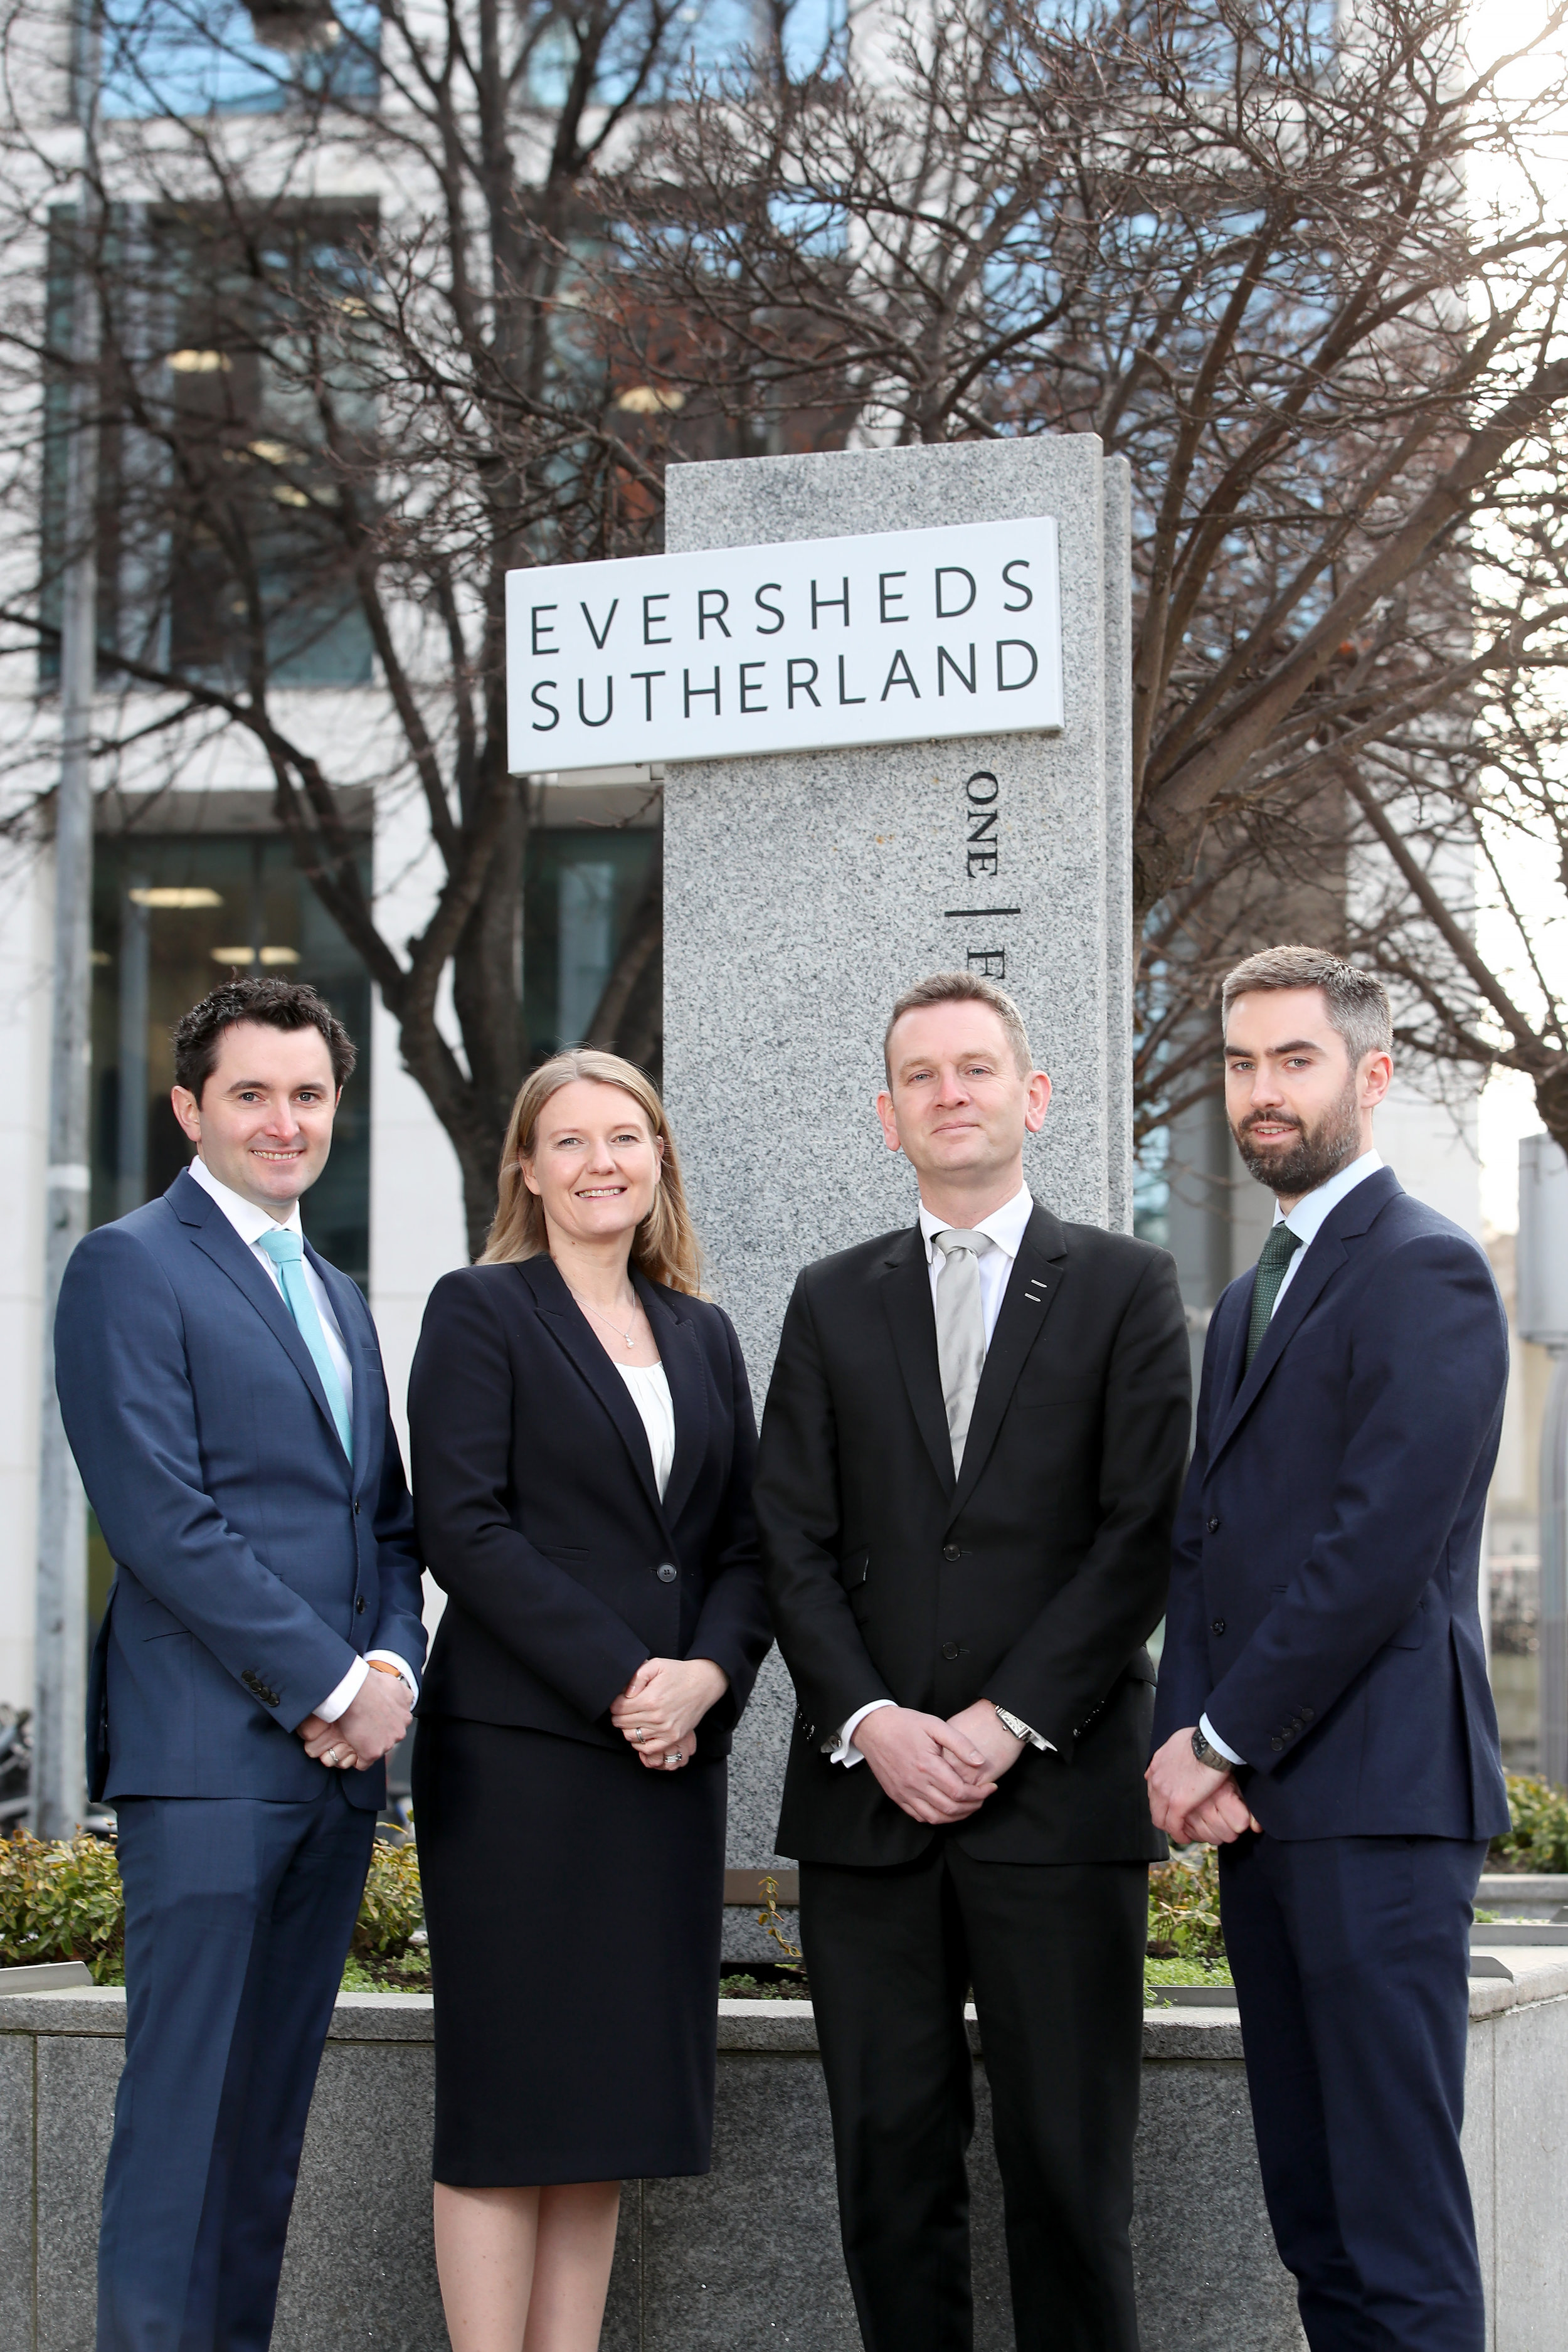 From left to right:  Lorcan Keenan, Partner, Pensions (Dublin), Lisa Bryson, Partner, Employment & Immigration (Belfast), Alan Murphy, Managing Partner Eversheds Sutherland, Enda Cullivan, Partner, Corporate & Commercial (Dublin)